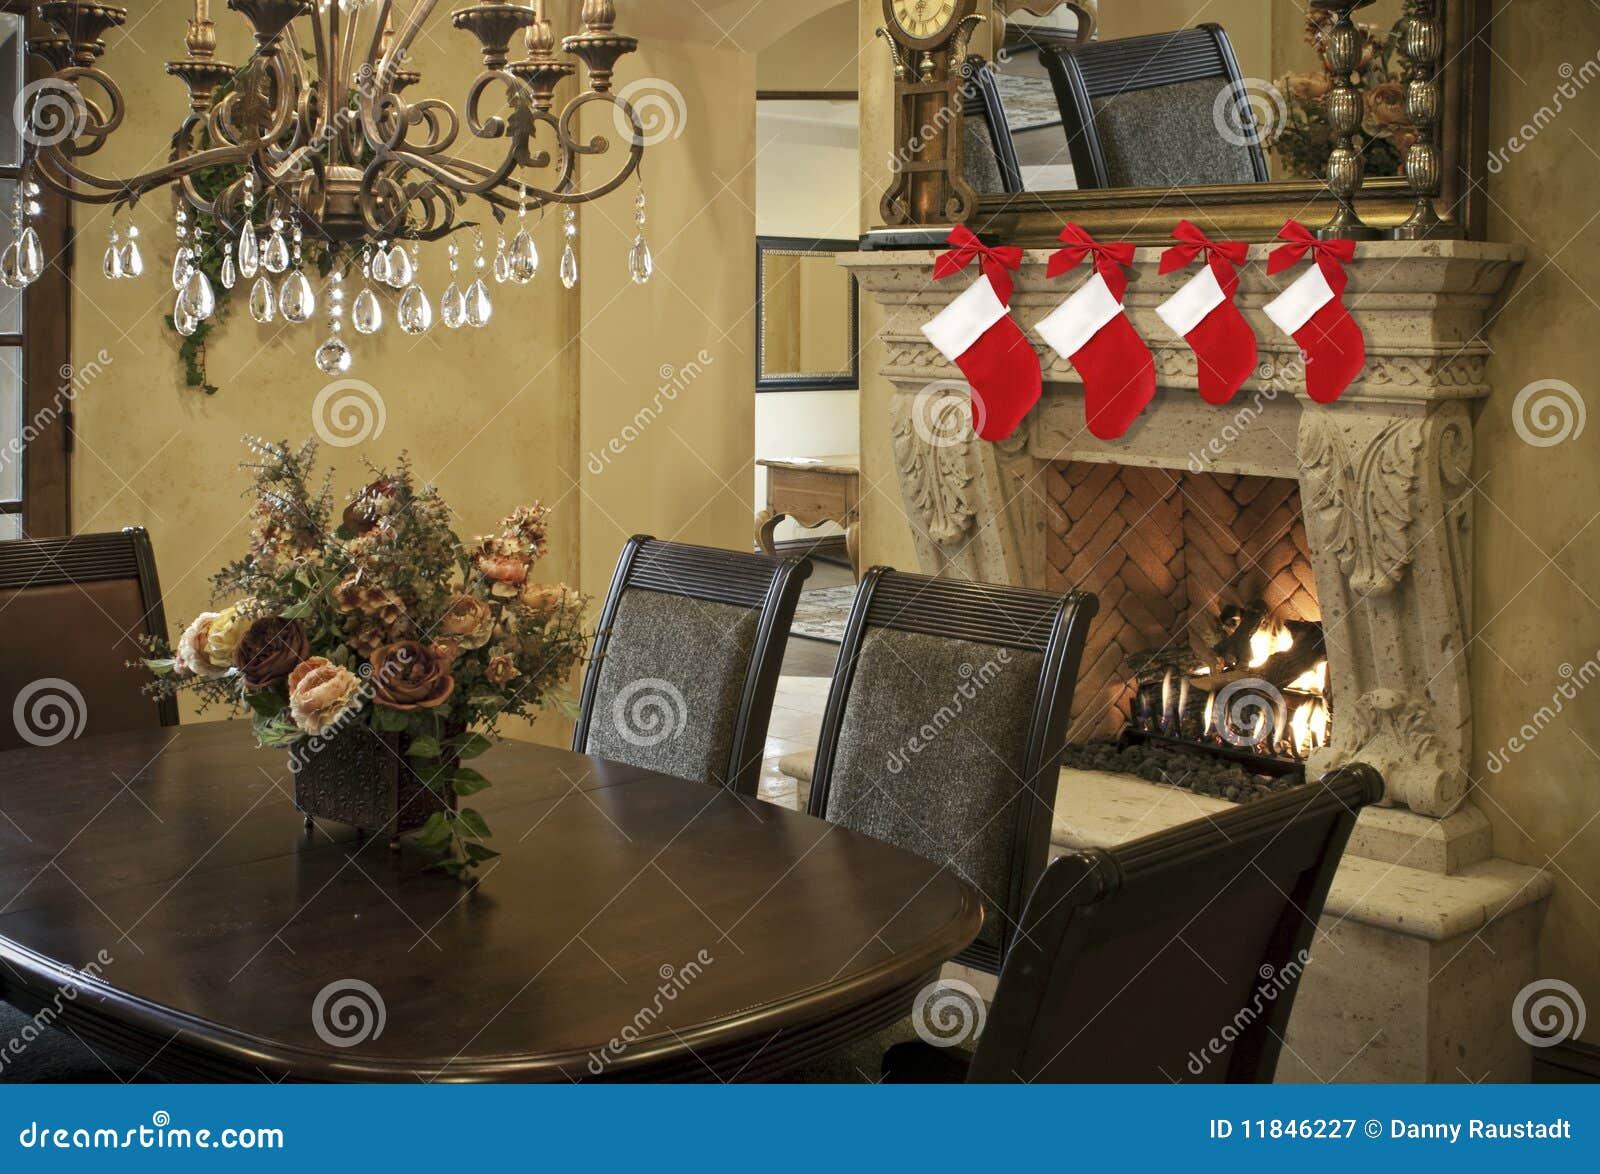 Christmas Stockings On Fireplace Mantel Royalty Free Stock